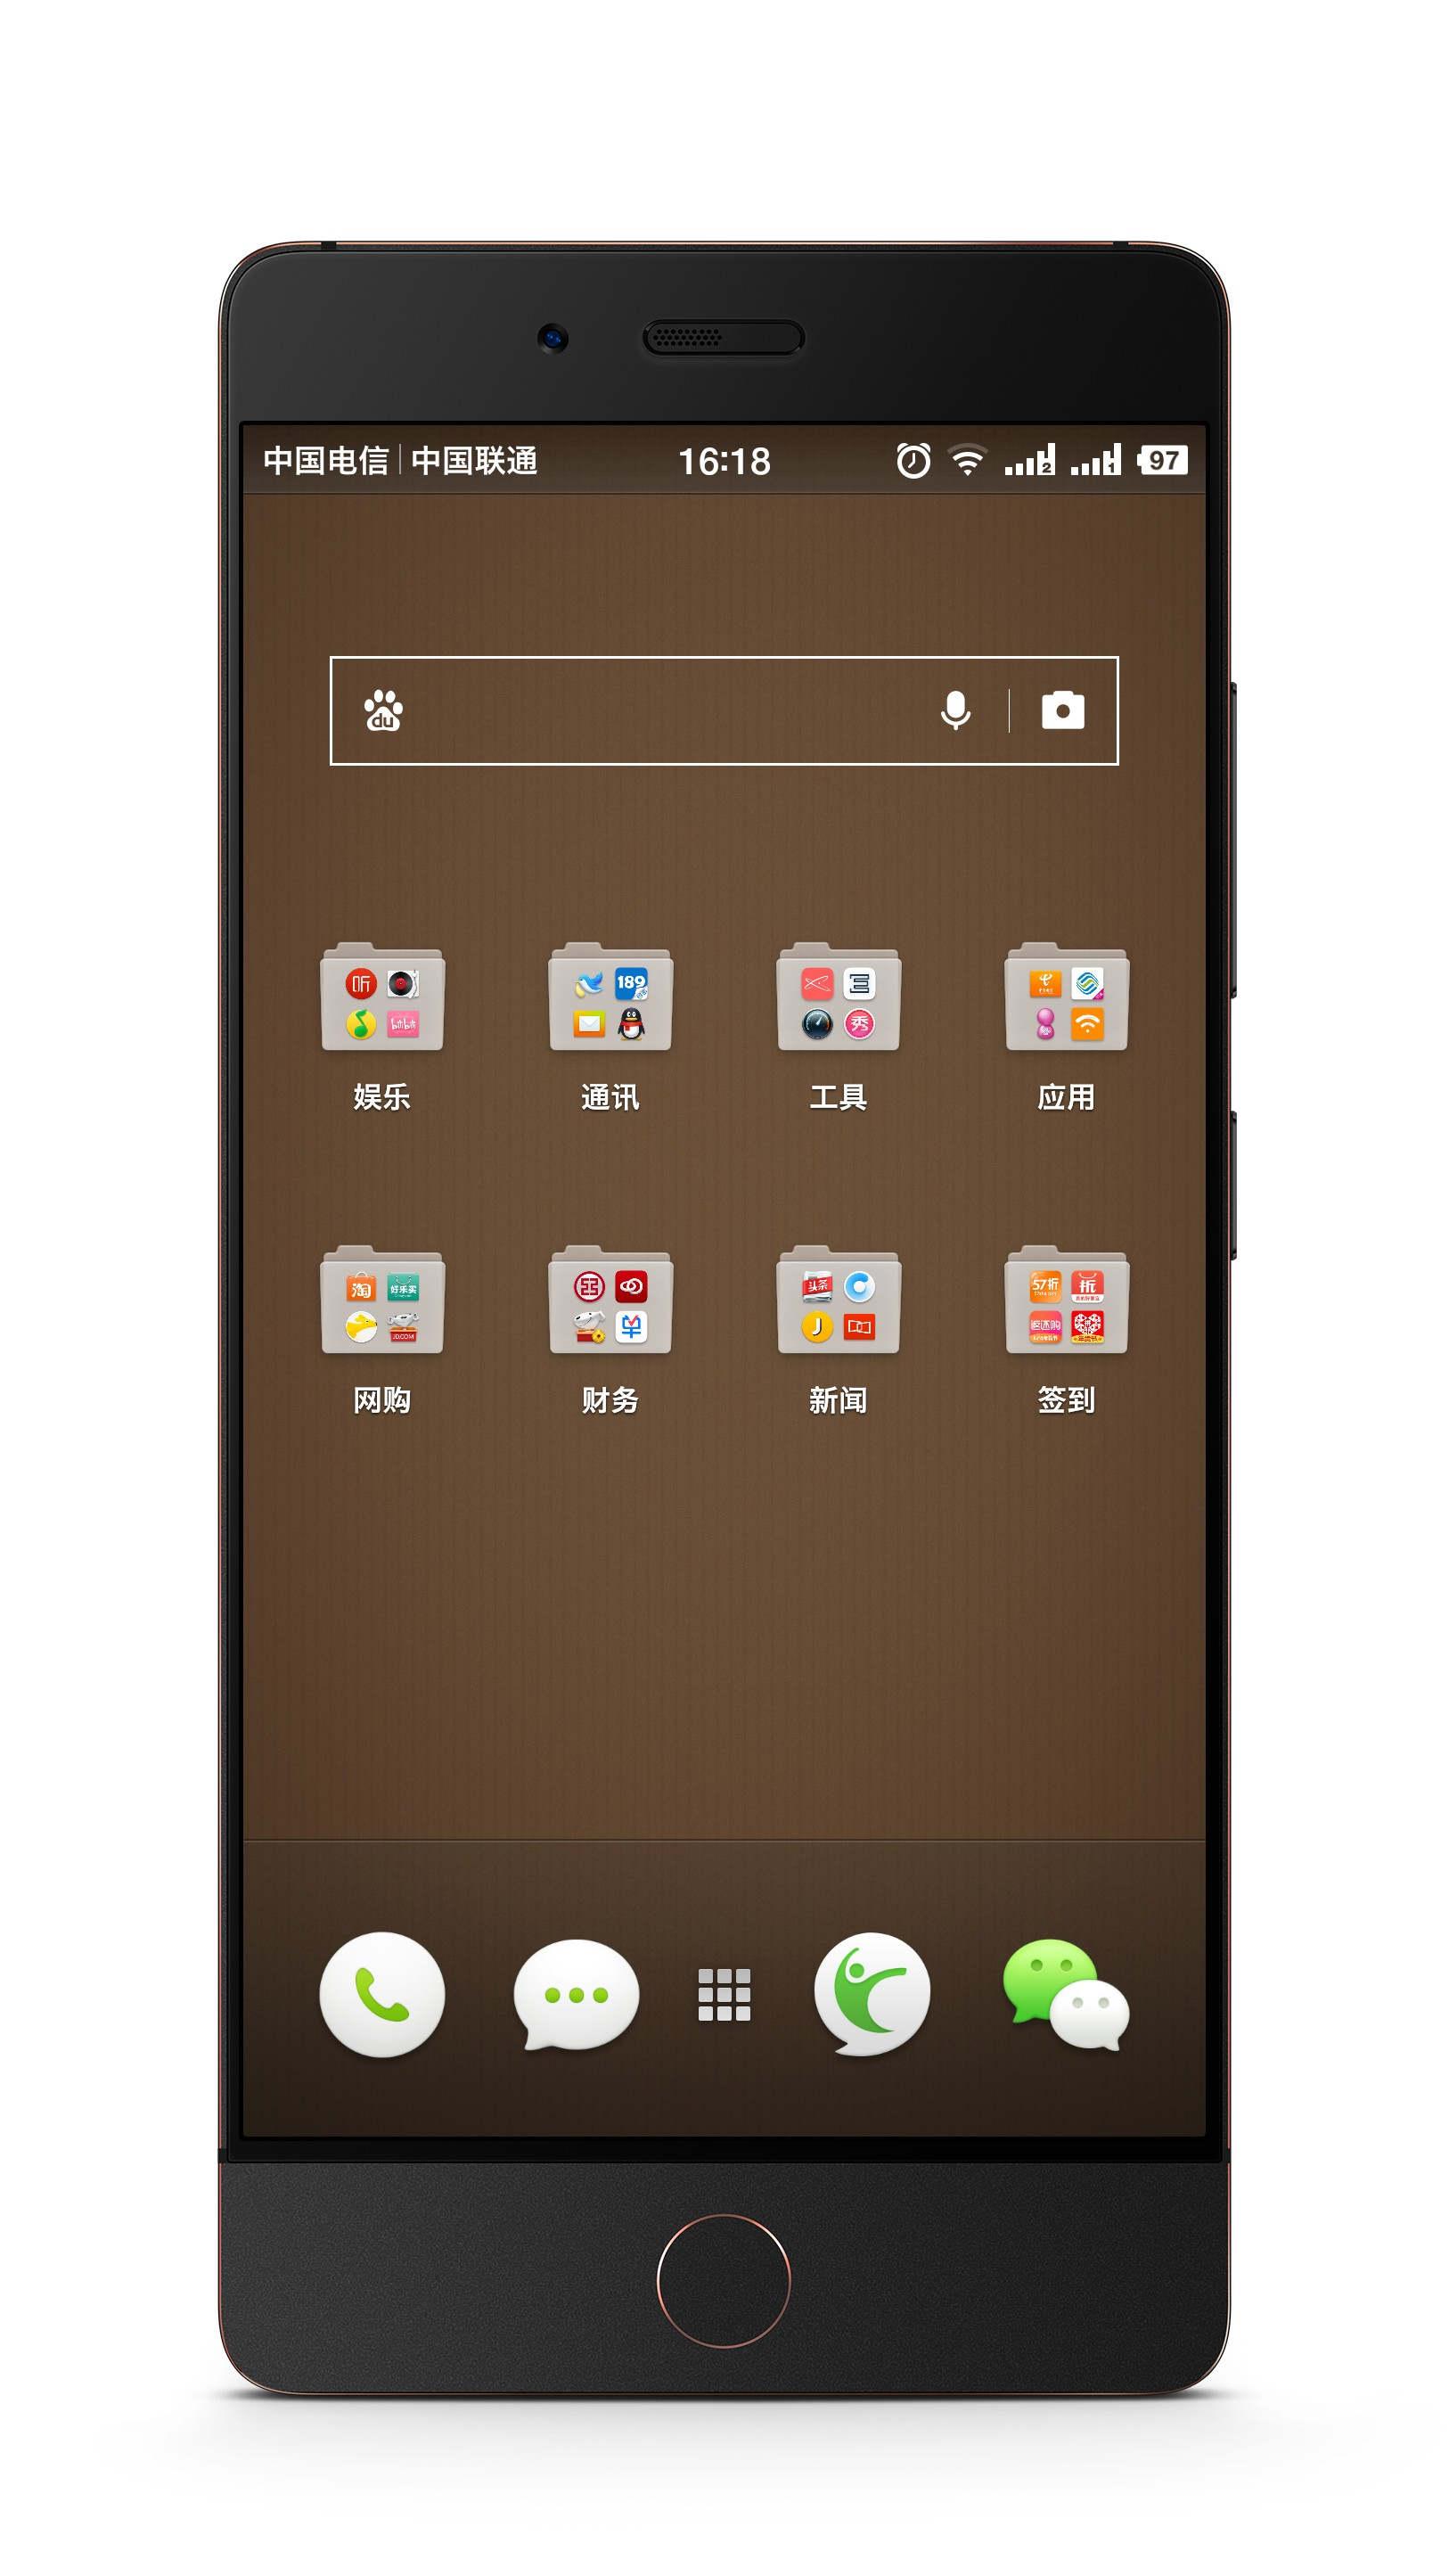 Screenshot_2018-01-12-16-19-08-900_??.png